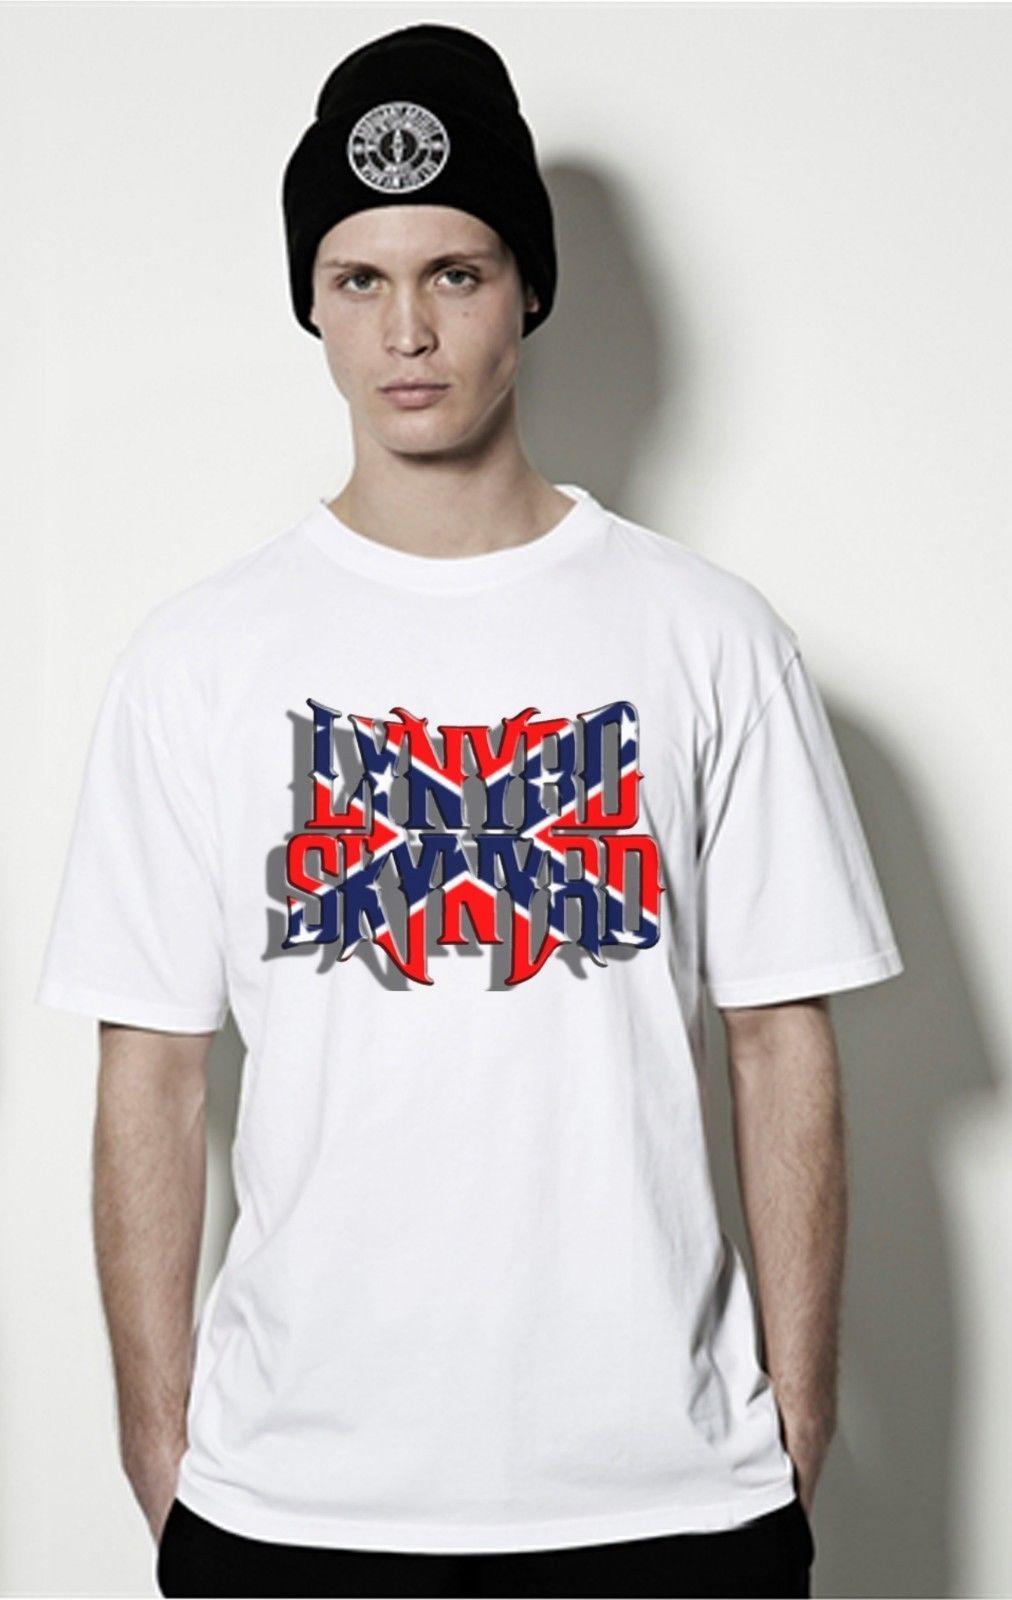 New Top Banner Lynyrd55 Skynyrd55 Logo Classic Rock Band T Shirt